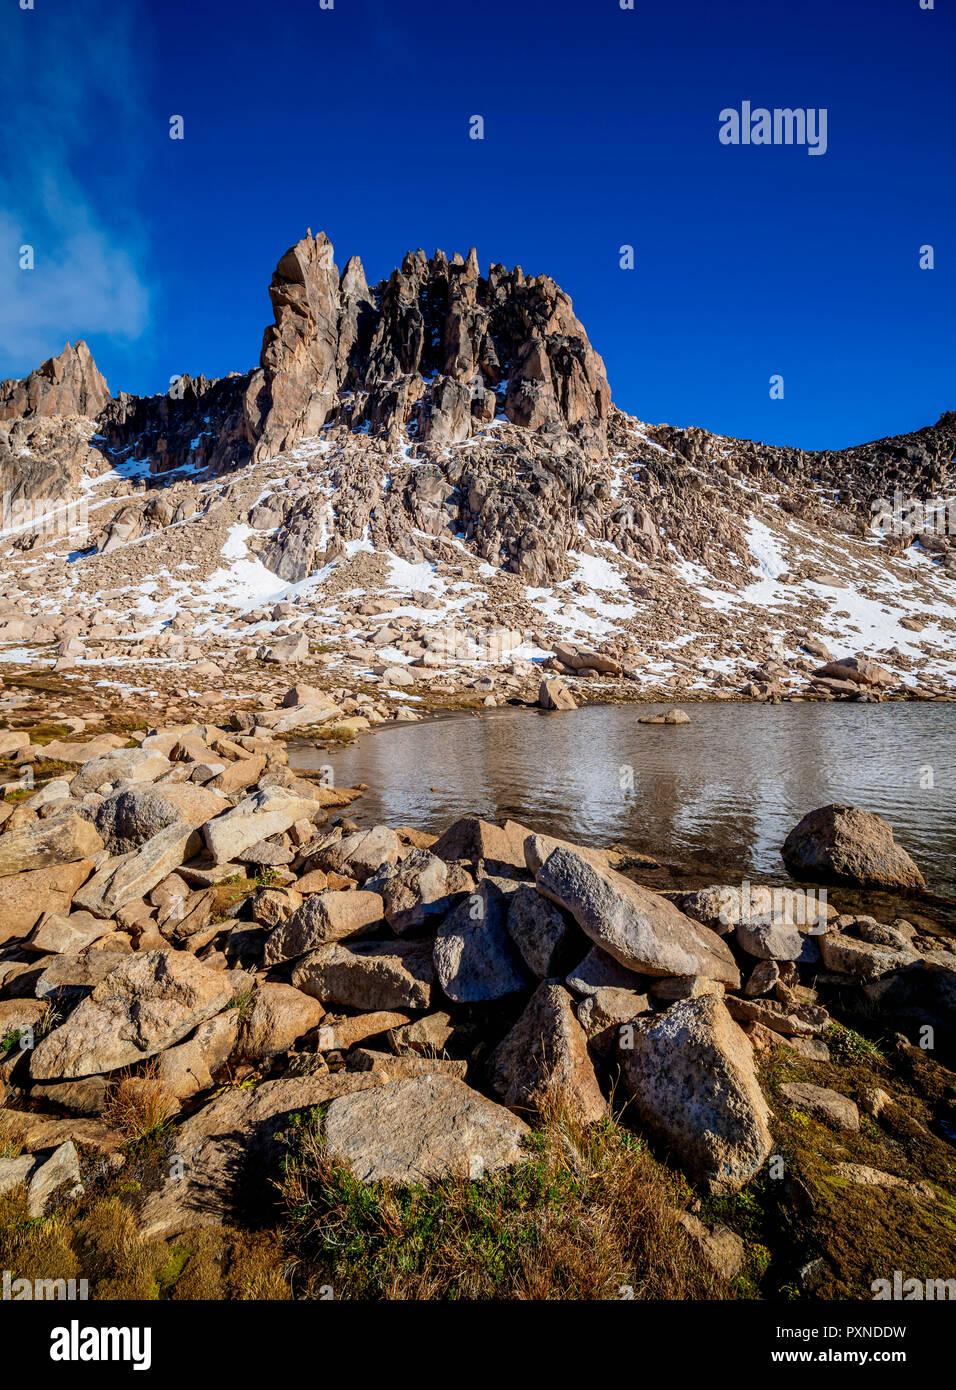 Schmoll Lagoon and Cerro Melisa, Nahuel Huapi National Park, Rio Negro Province, Argentina - Stock Image